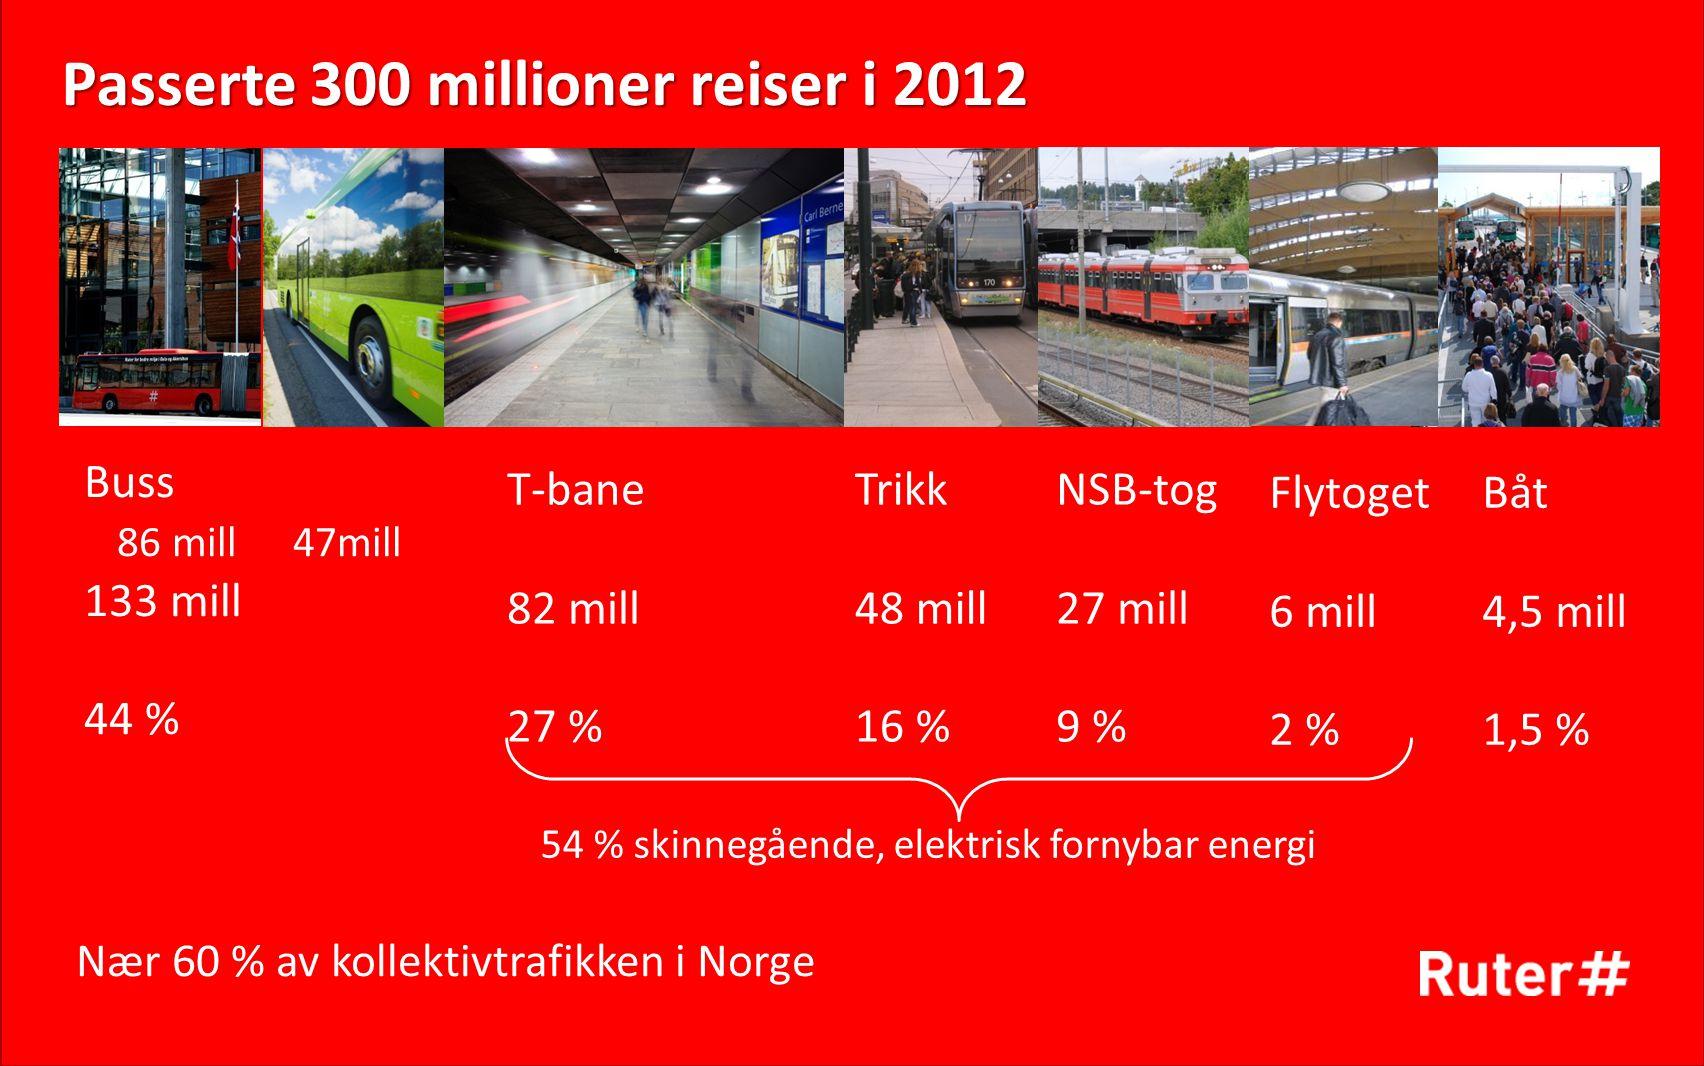 Passerte 300 millioner reiser i 2012 Buss 86 mill 47mill 133 mill 44 % T-bane 82 mill 27 % Trikk 48 mill 16 % NSB-tog 27 mill 9 % Båt 4,5 mill 1,5 % 5